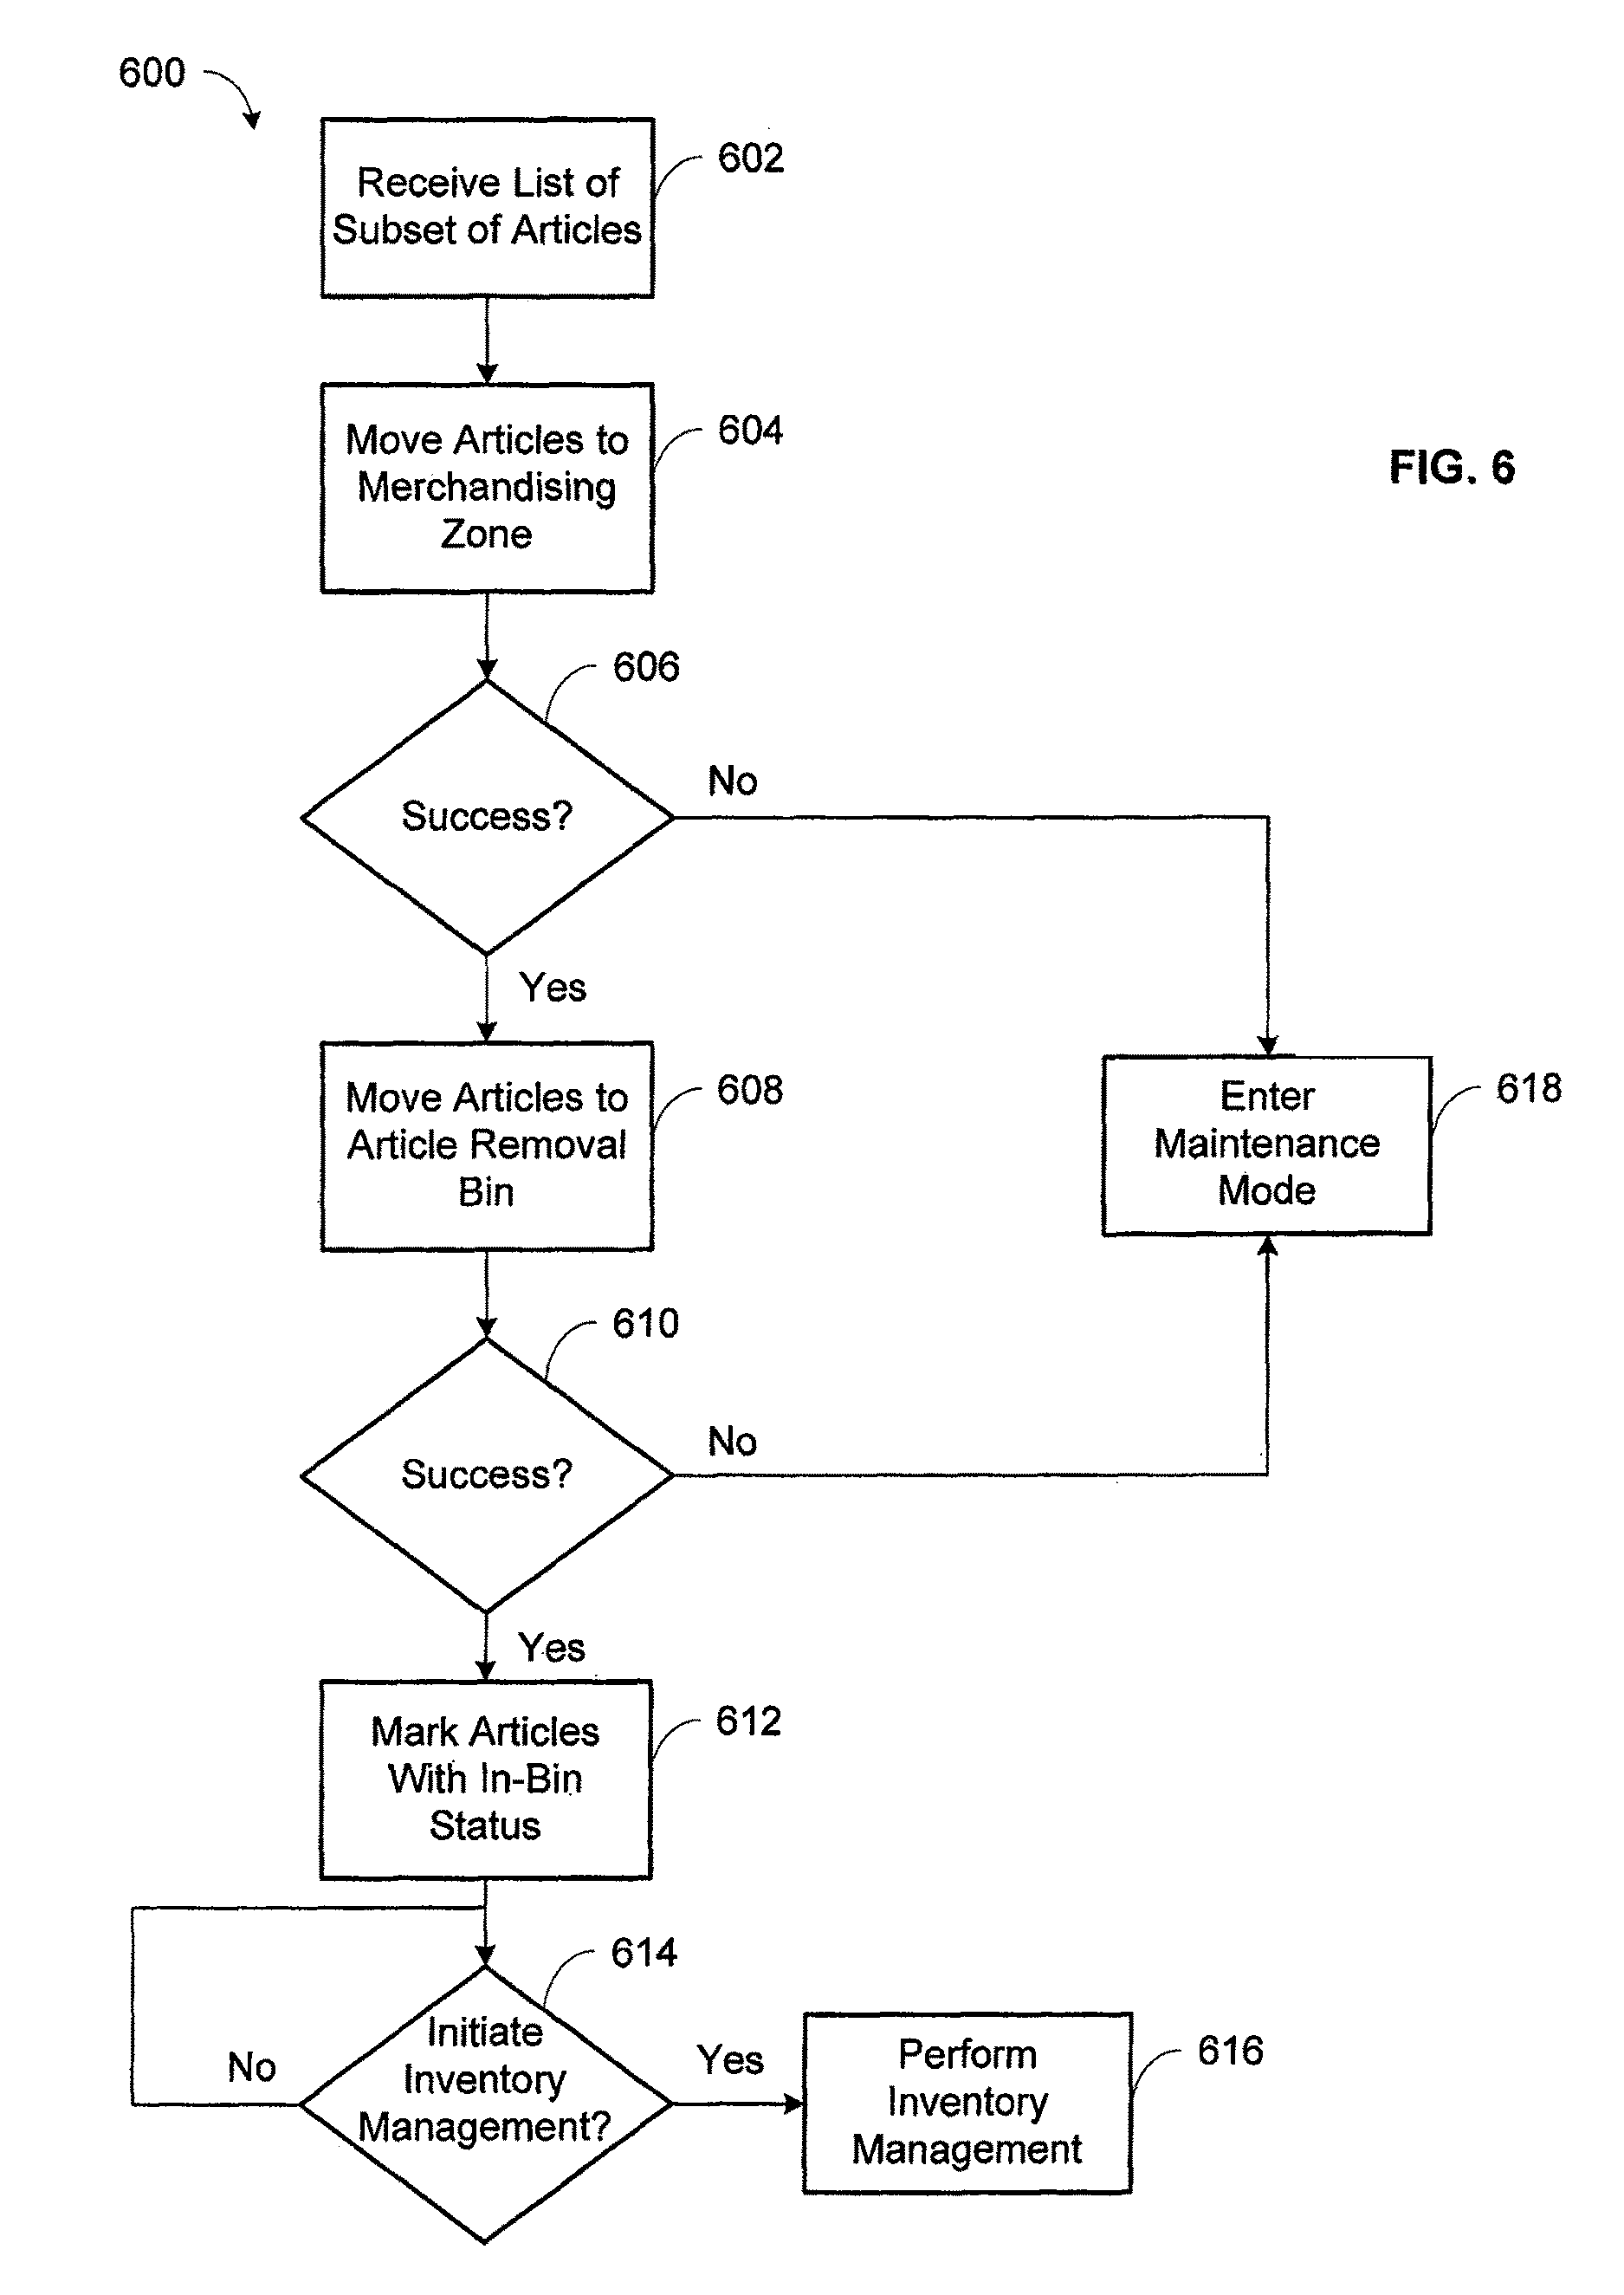 Patent US 9,916,714 B2